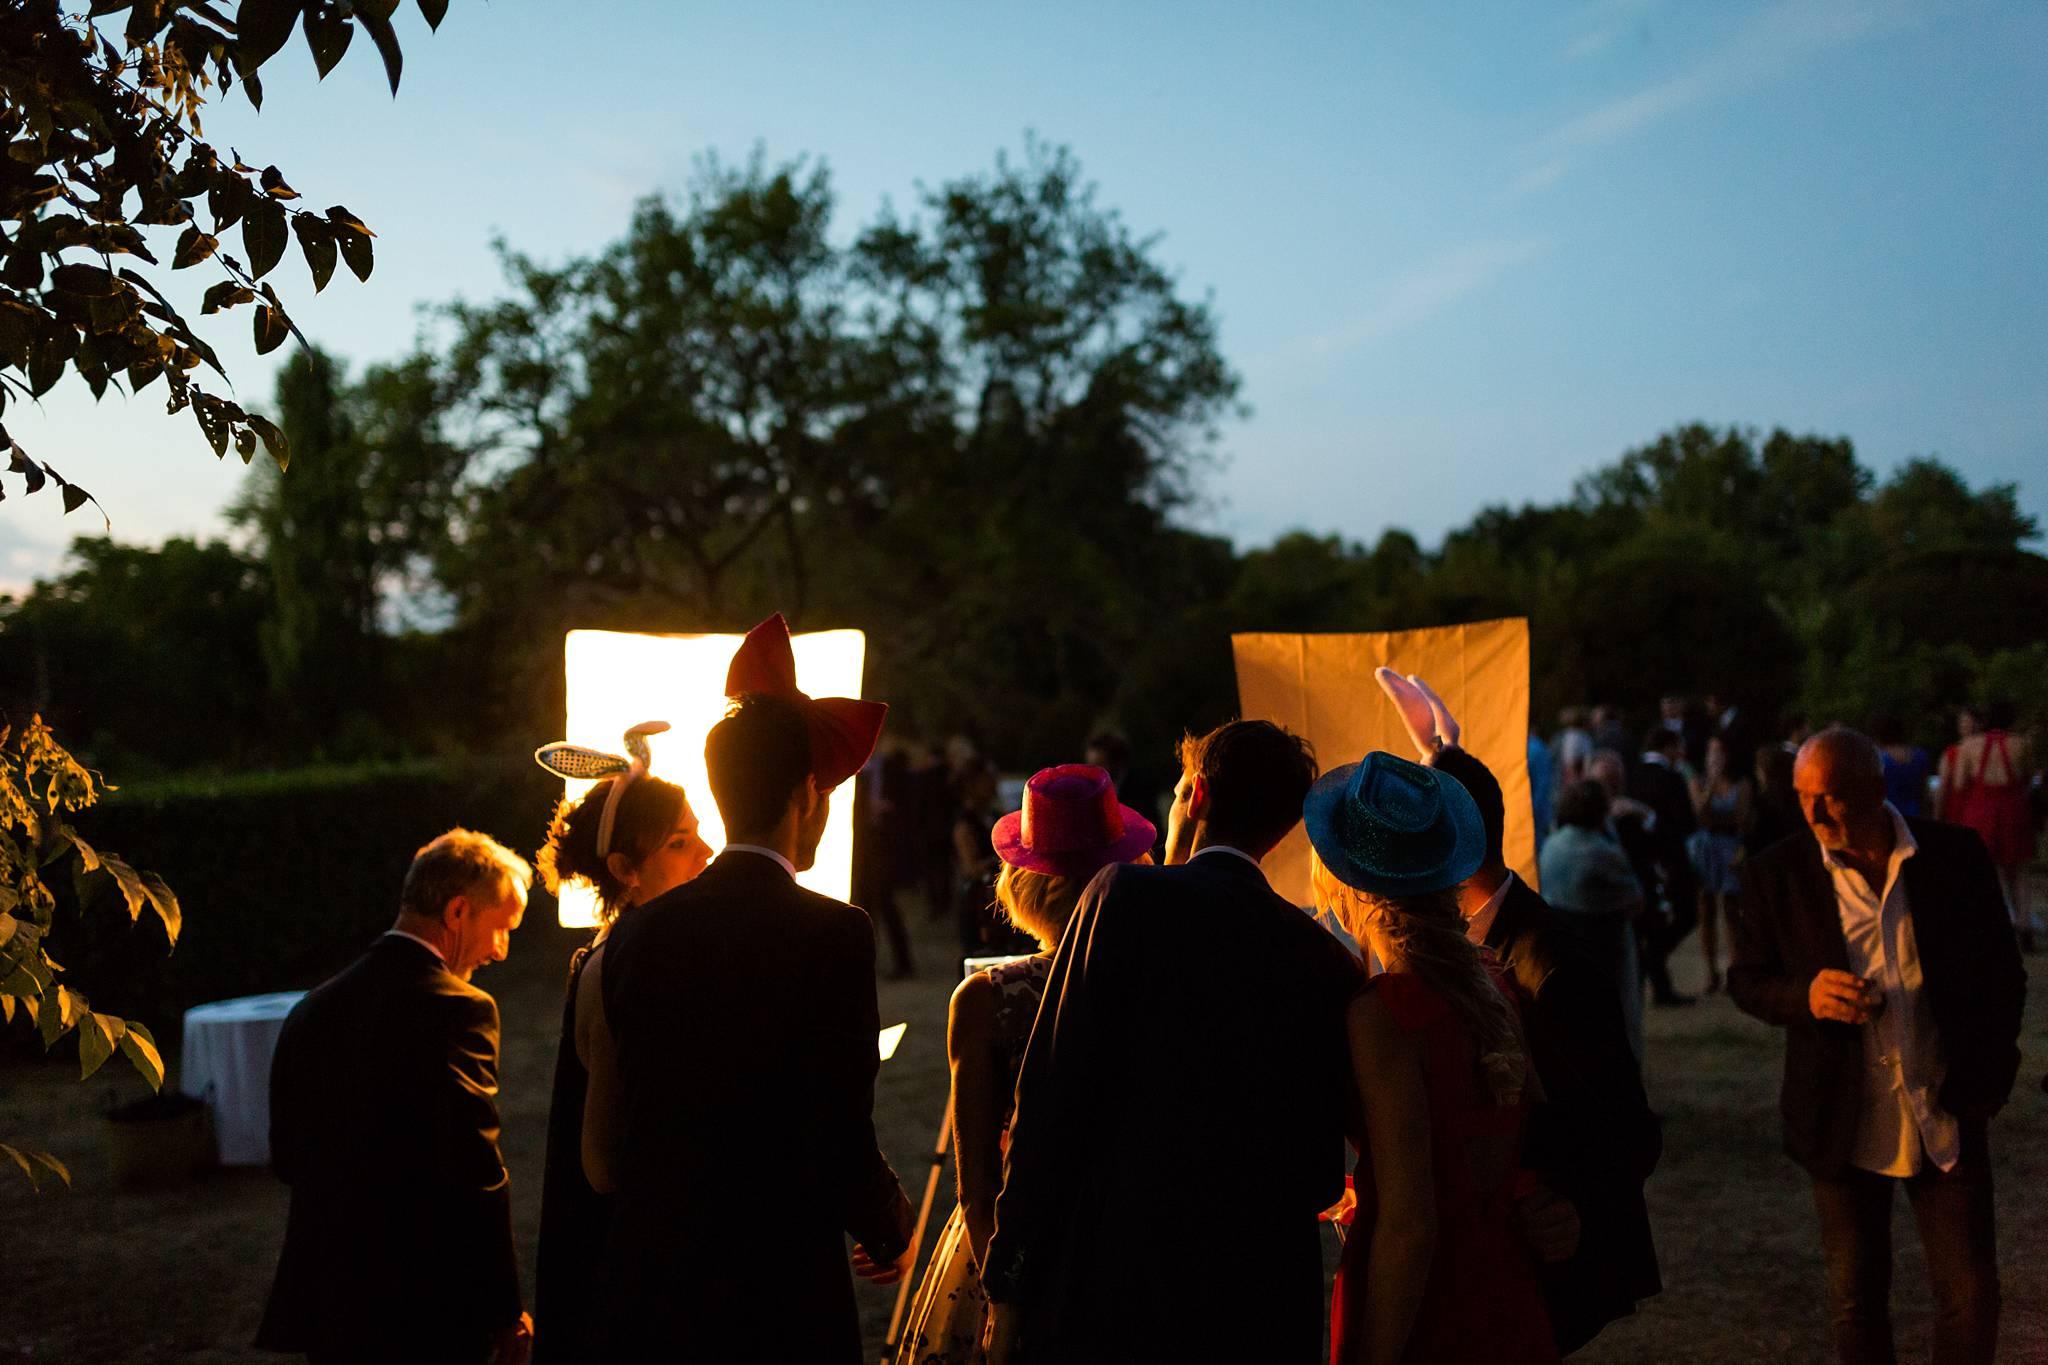 07_photobooth-mariage-backstage-bordeaux-gironde-dordogne-charentes-alexandre-roschewitz-photographies_2048px